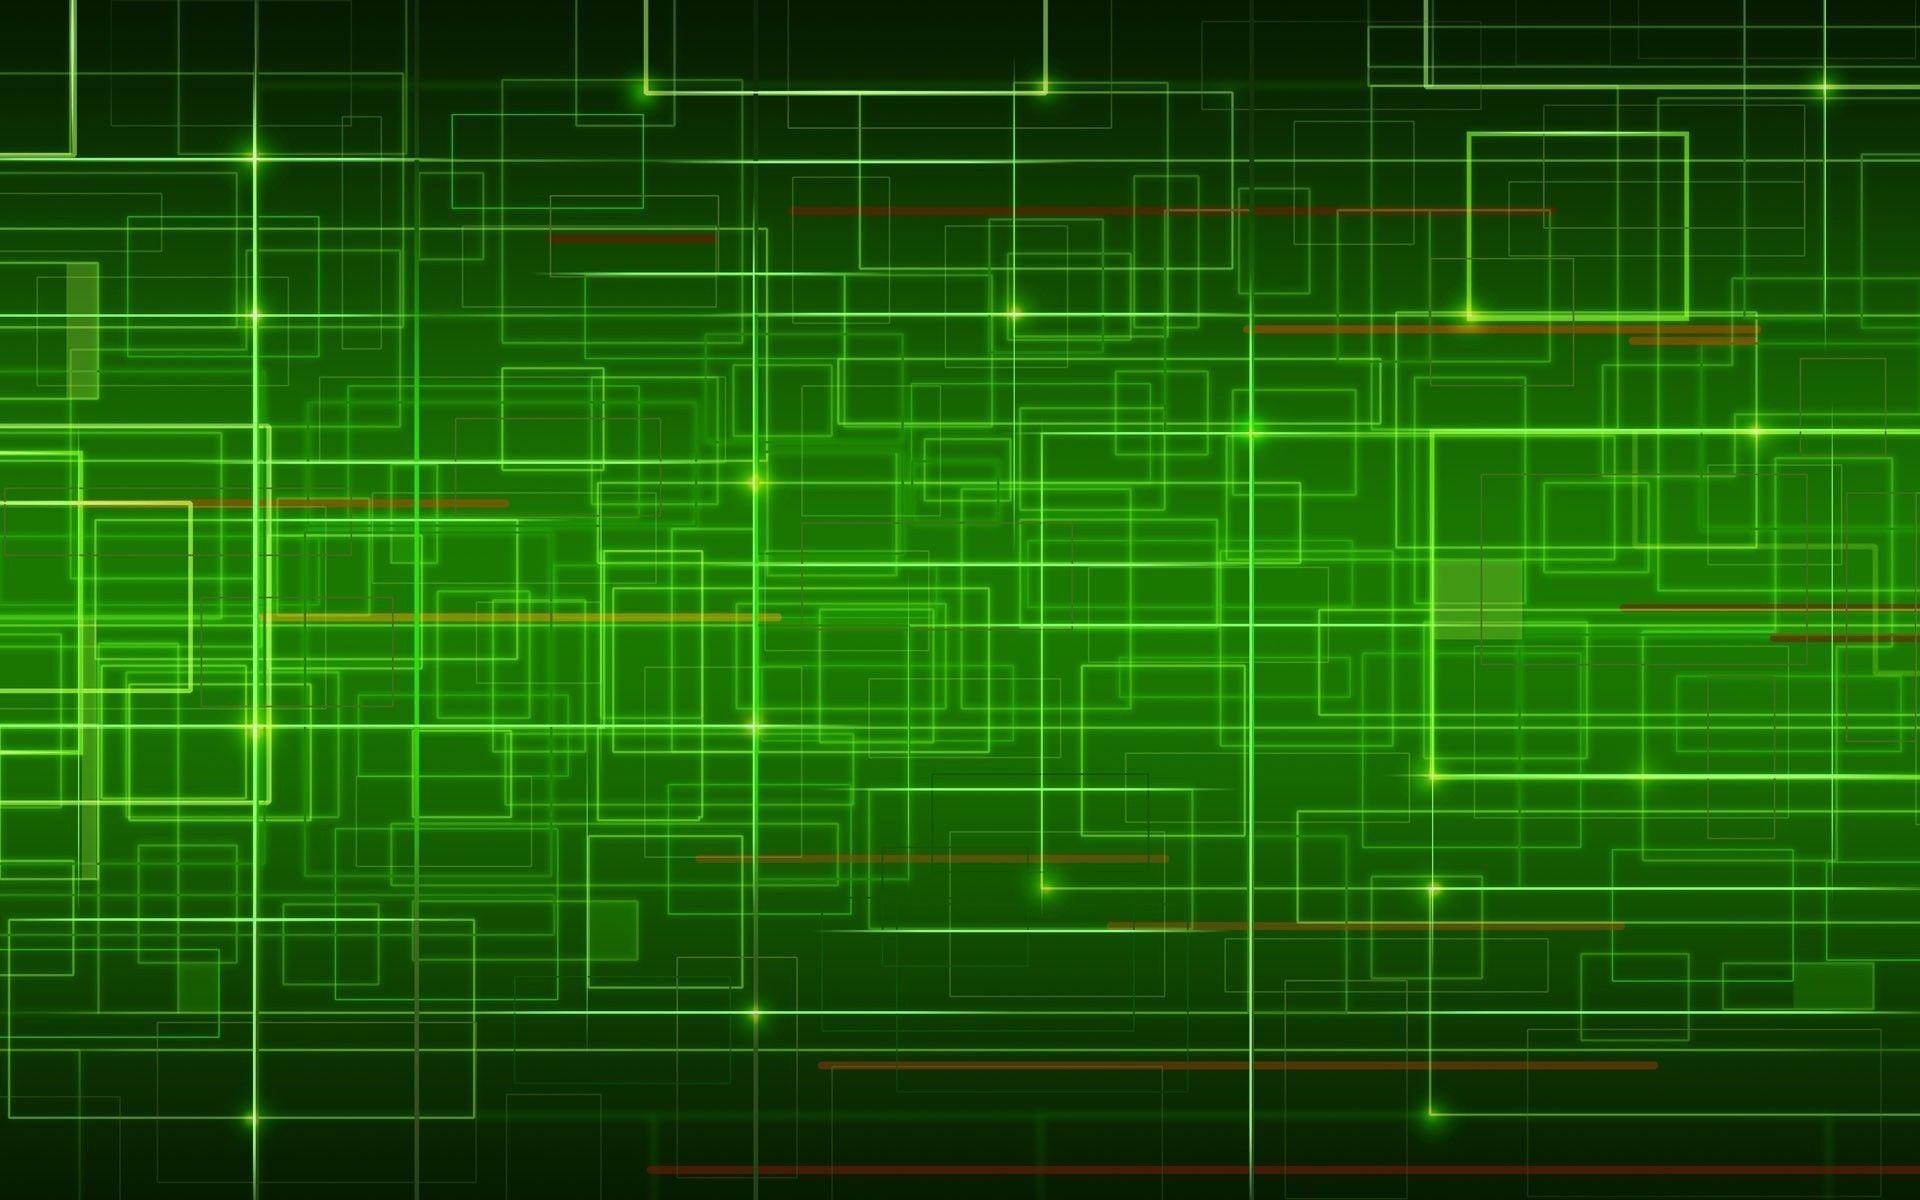 green neon background - photo #23